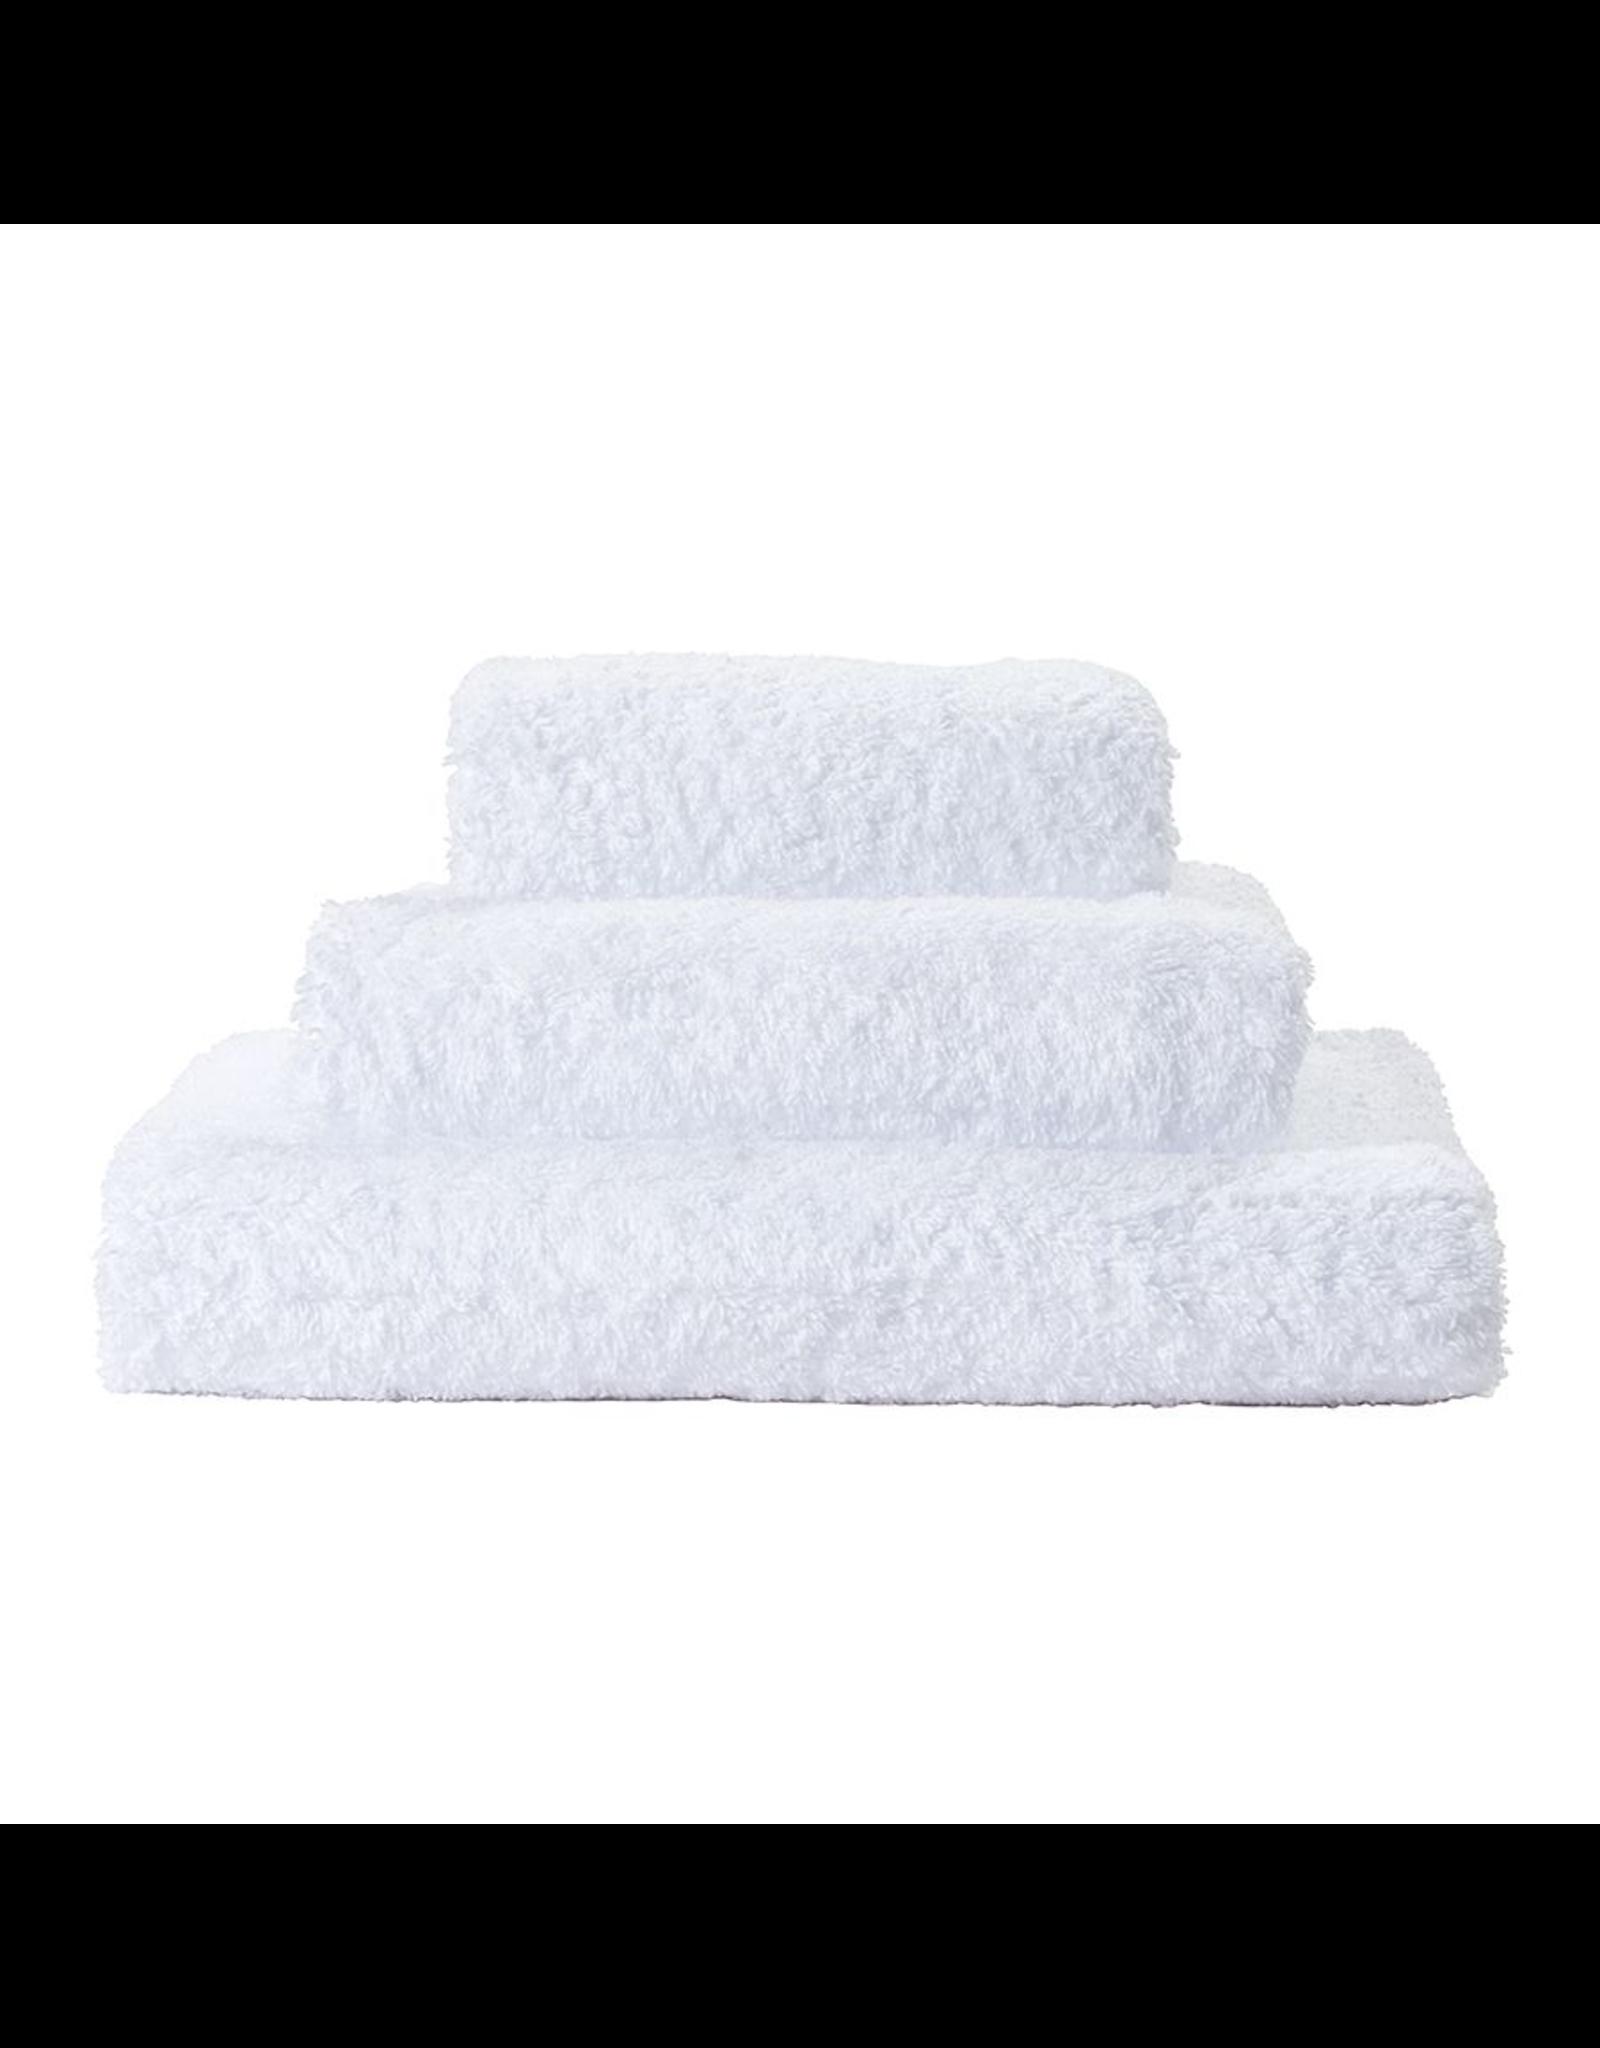 St. Geneve Super Pile Bath Towel 100% Egyptian Cotton, White